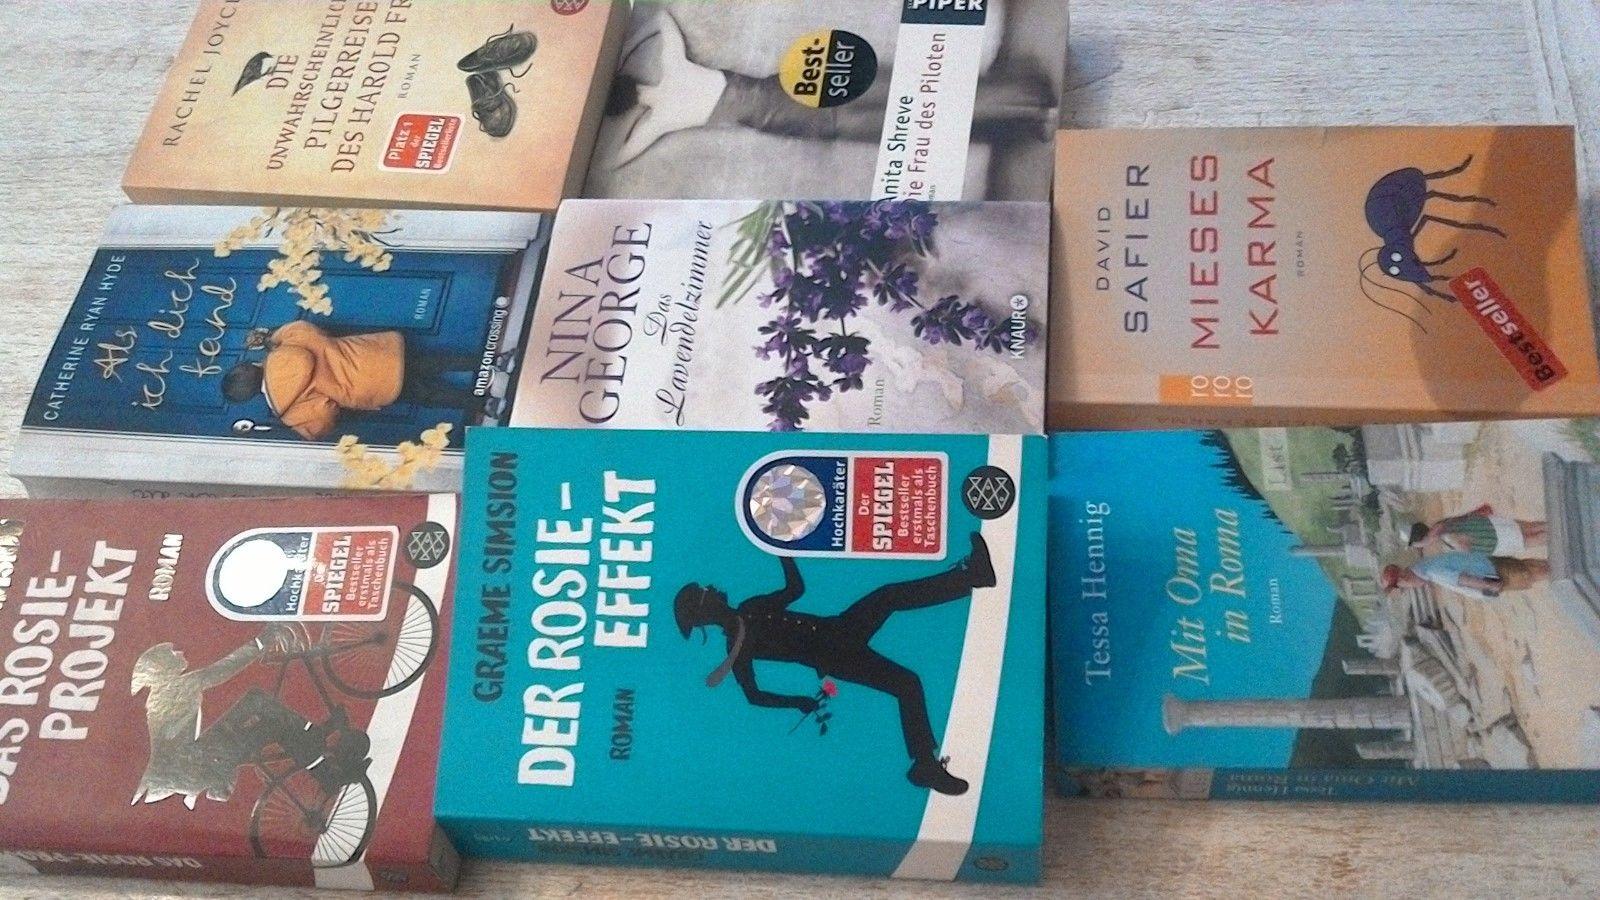 bücher paket romane belletristik